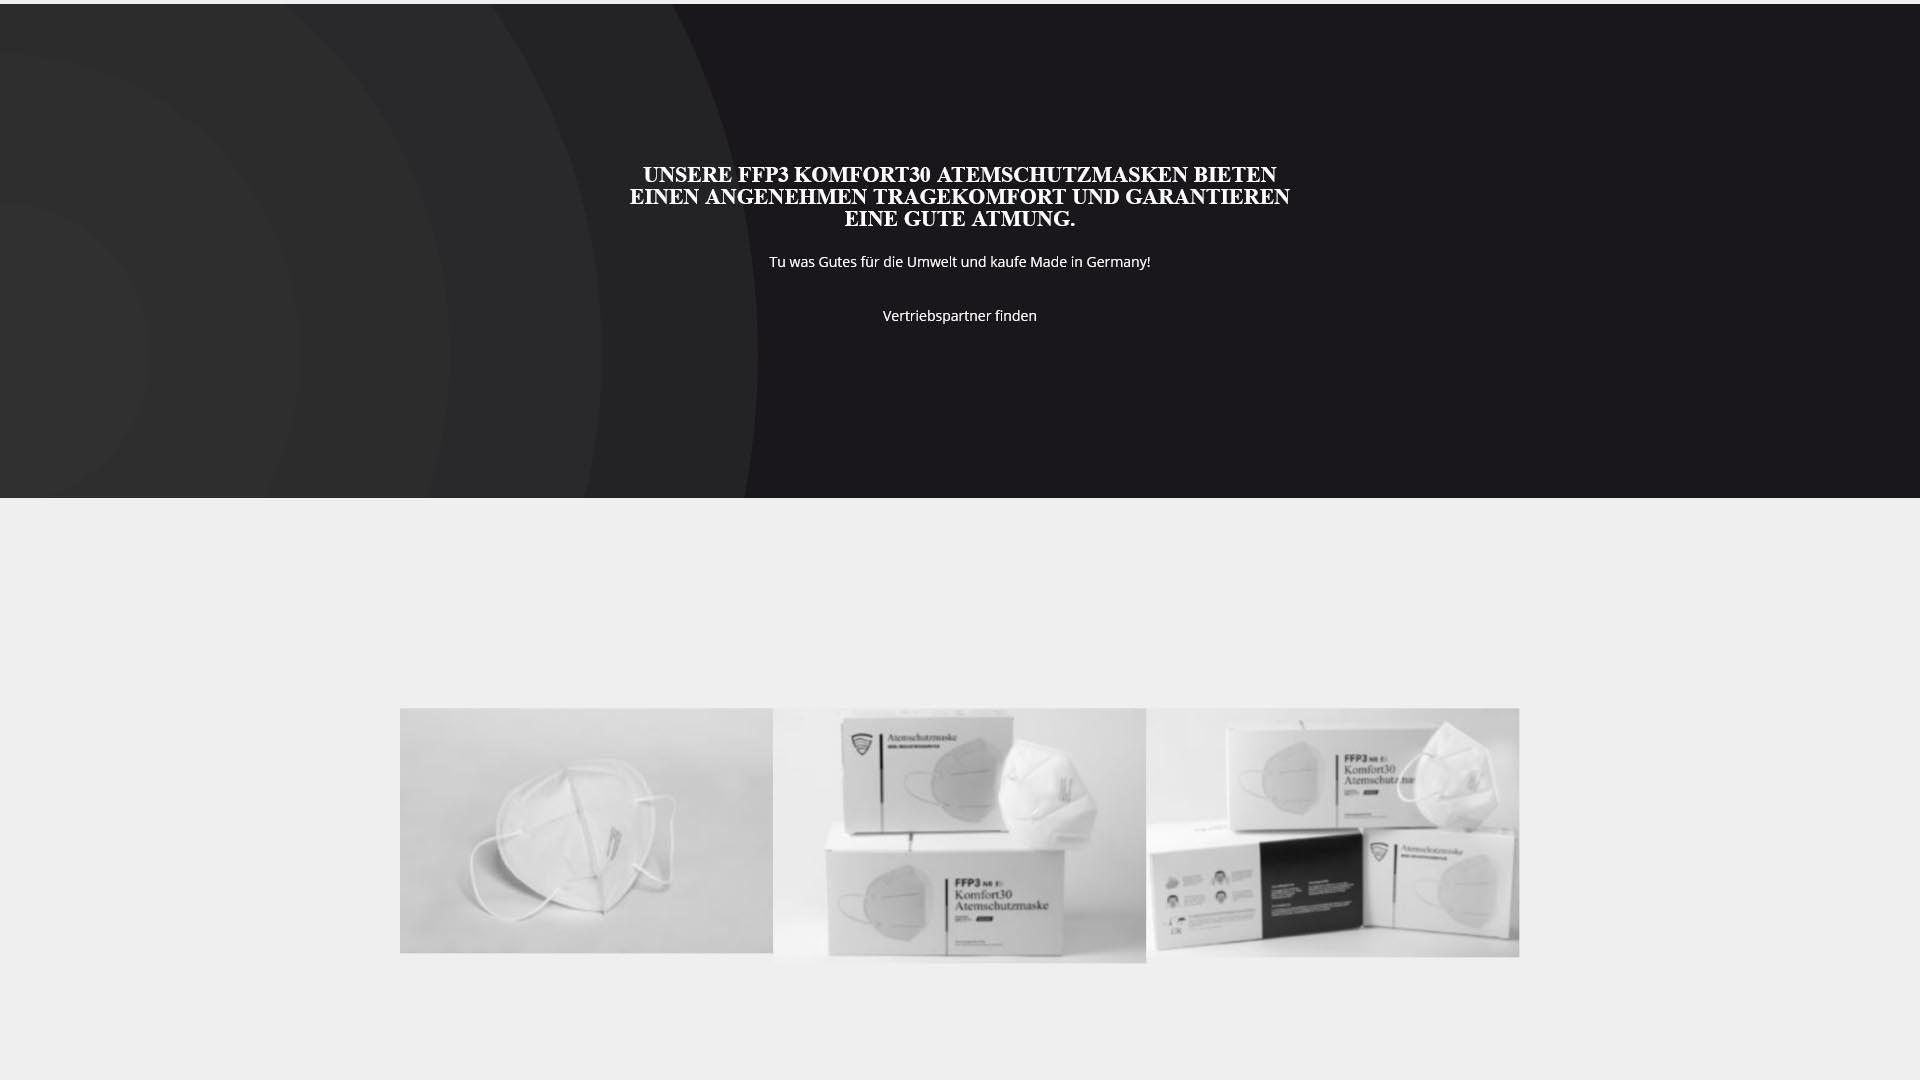 msk industrieservice atemschutzmasken ffp2 relaunch 8